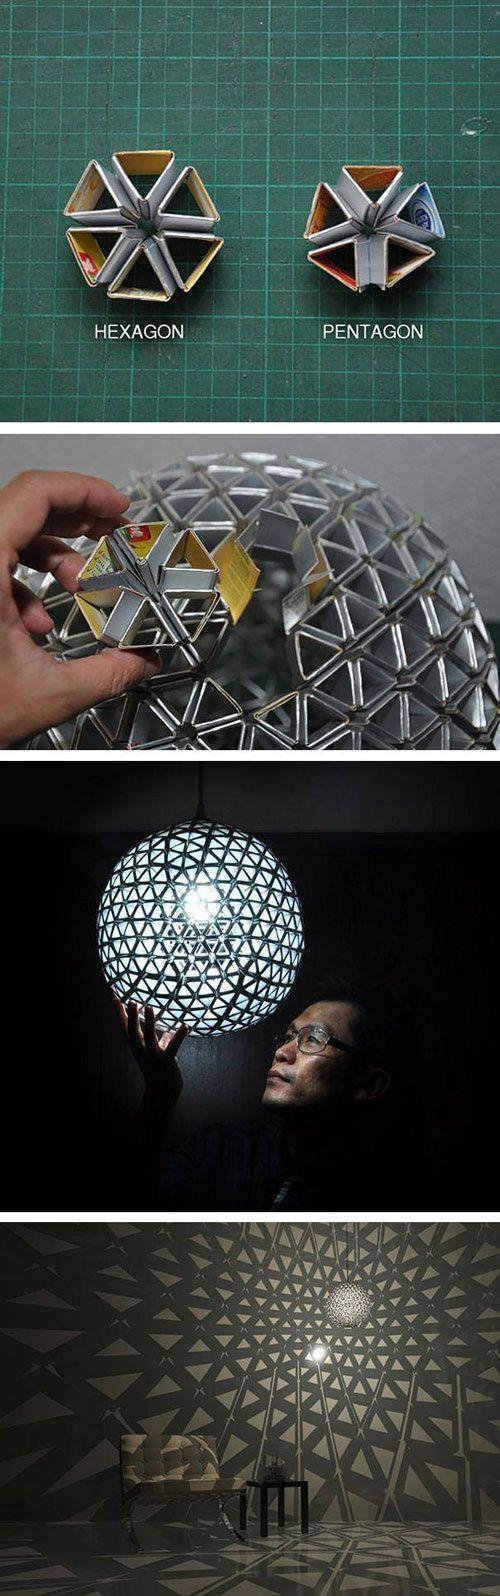 Awesome cardboard lamp.